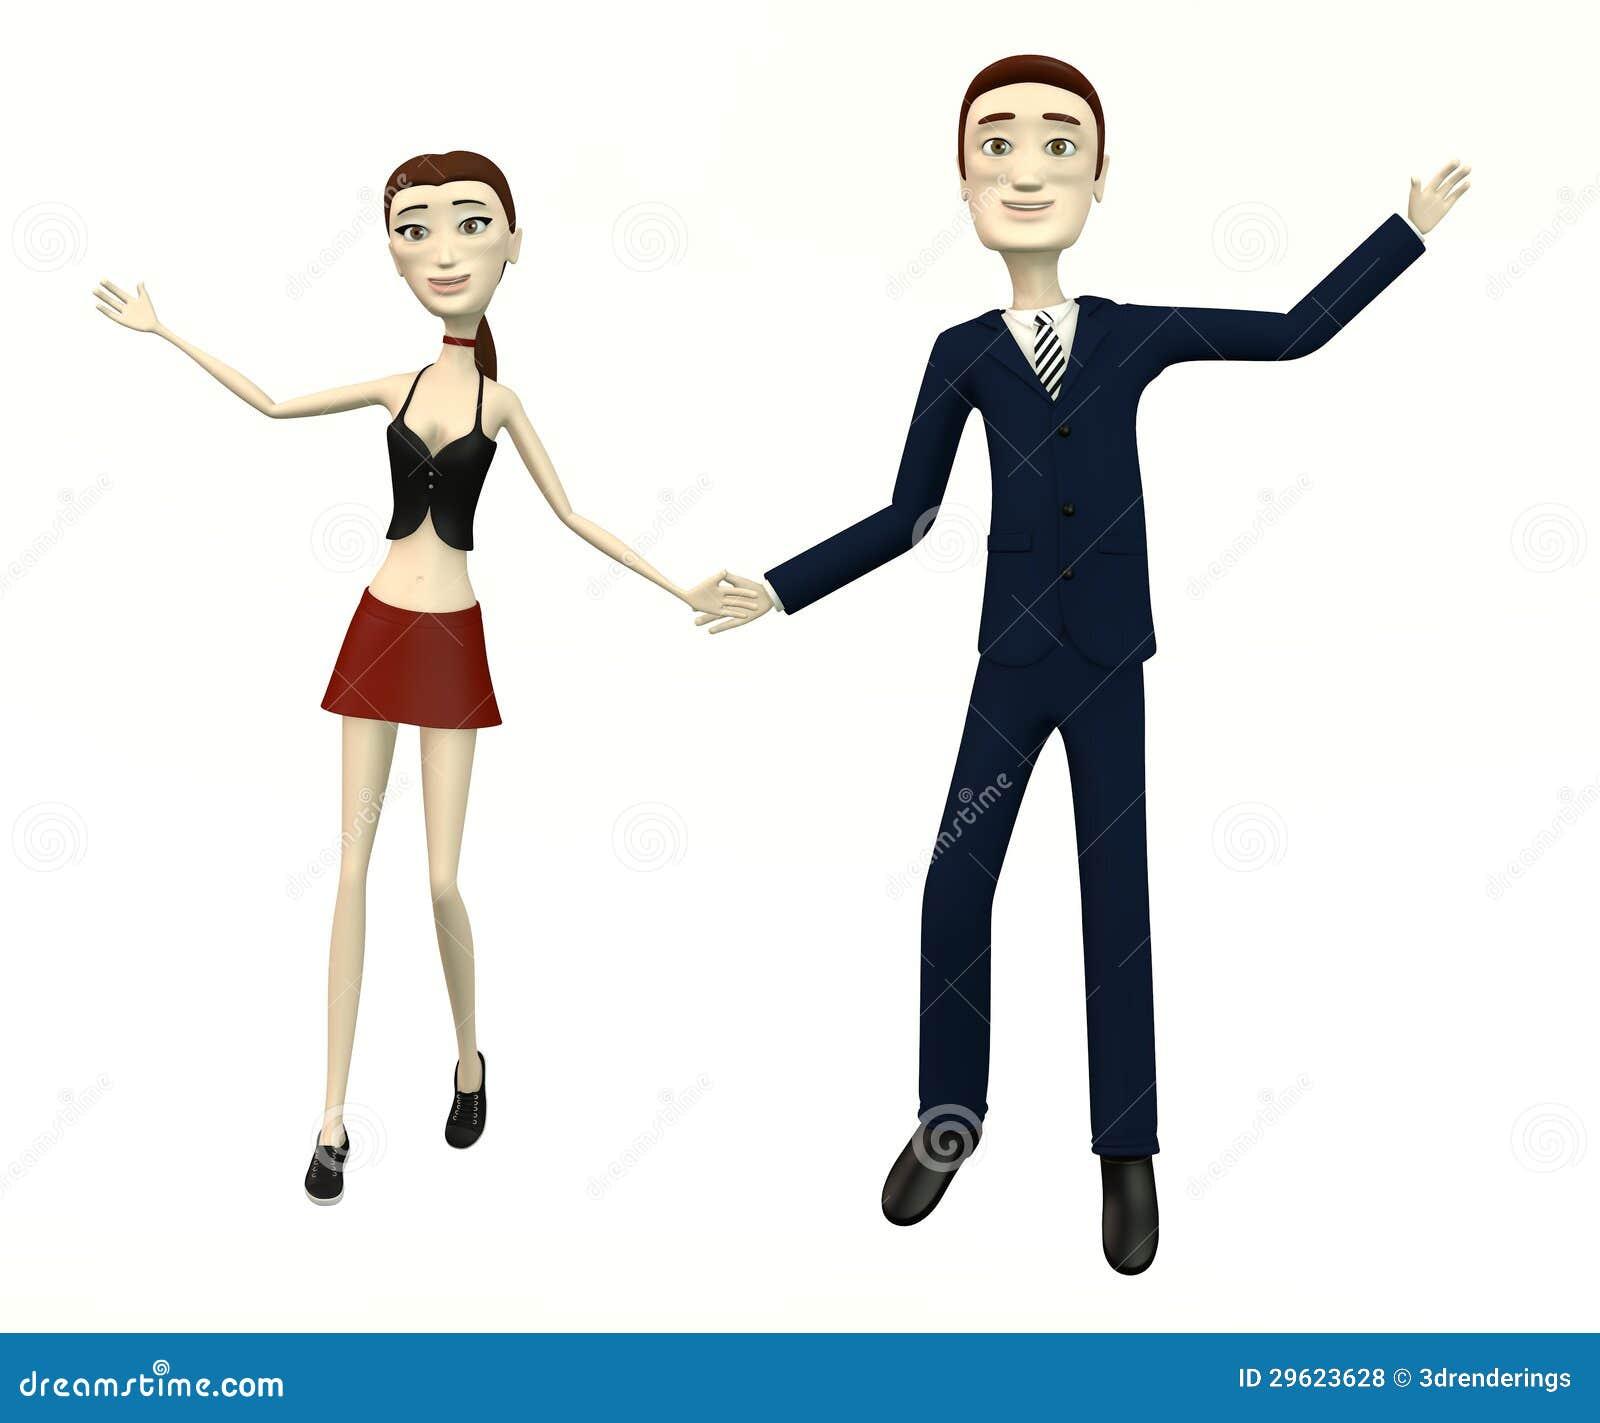 dancing cartoon characters